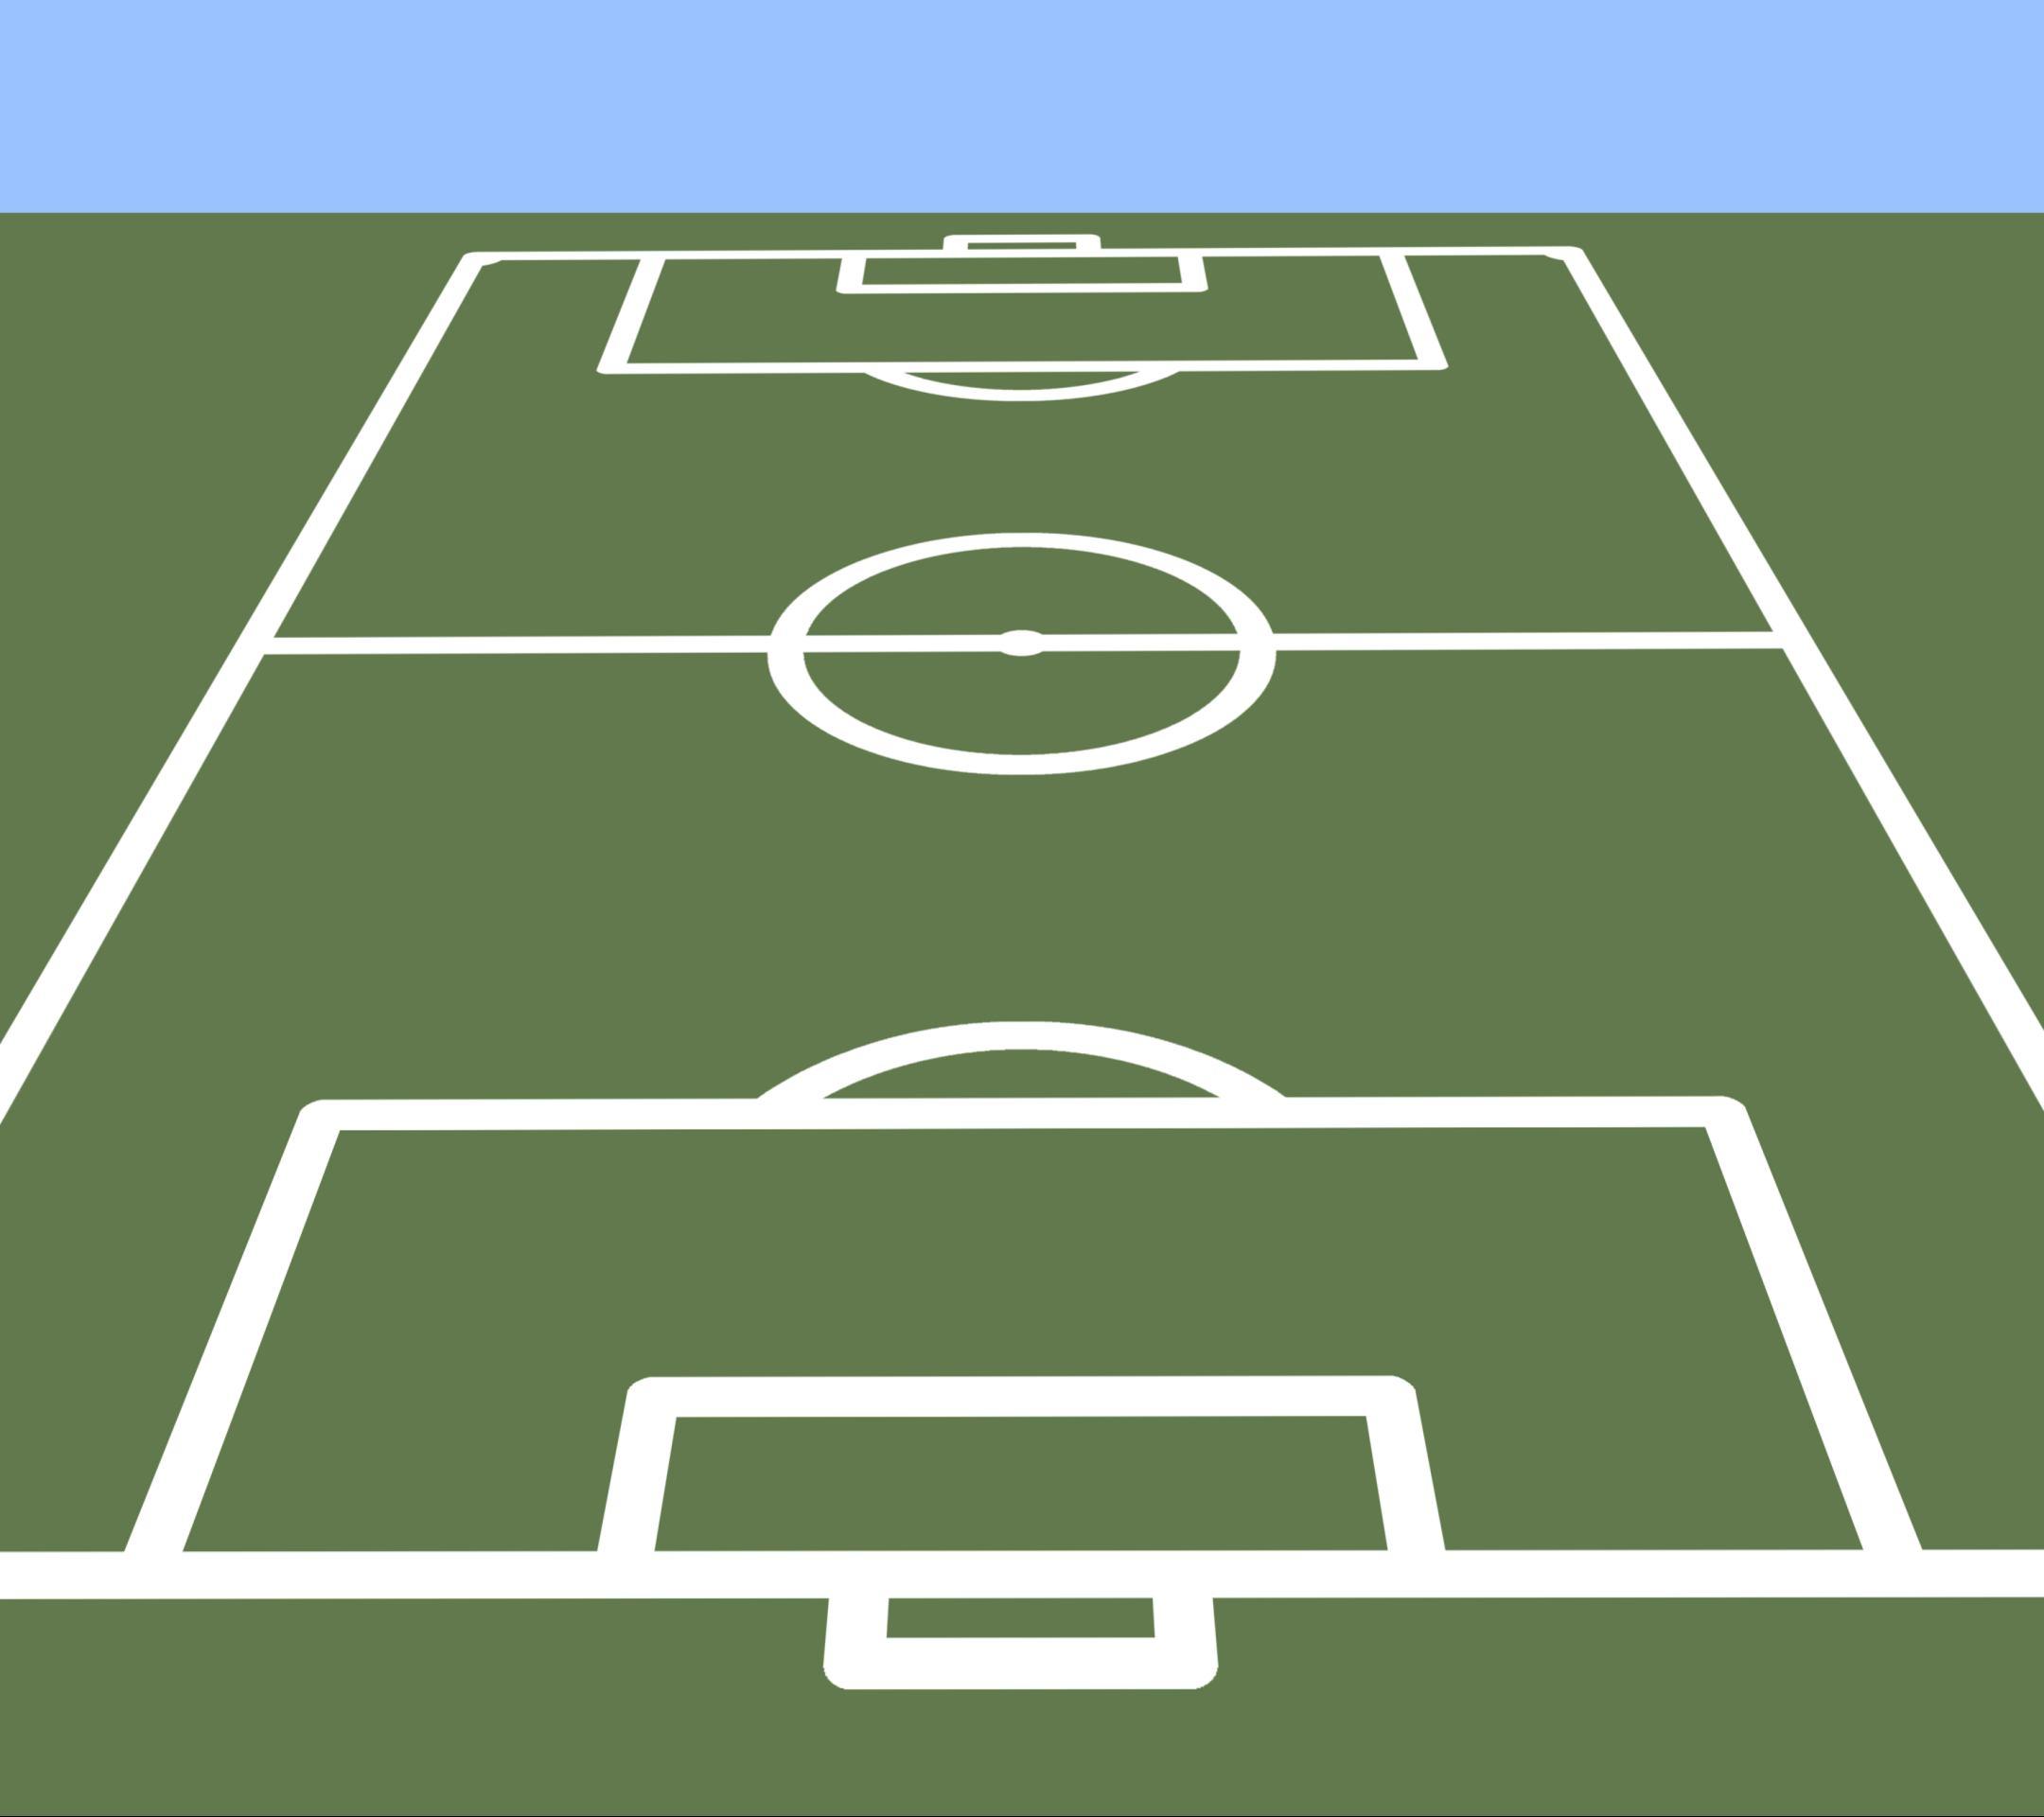 Fusballfeld